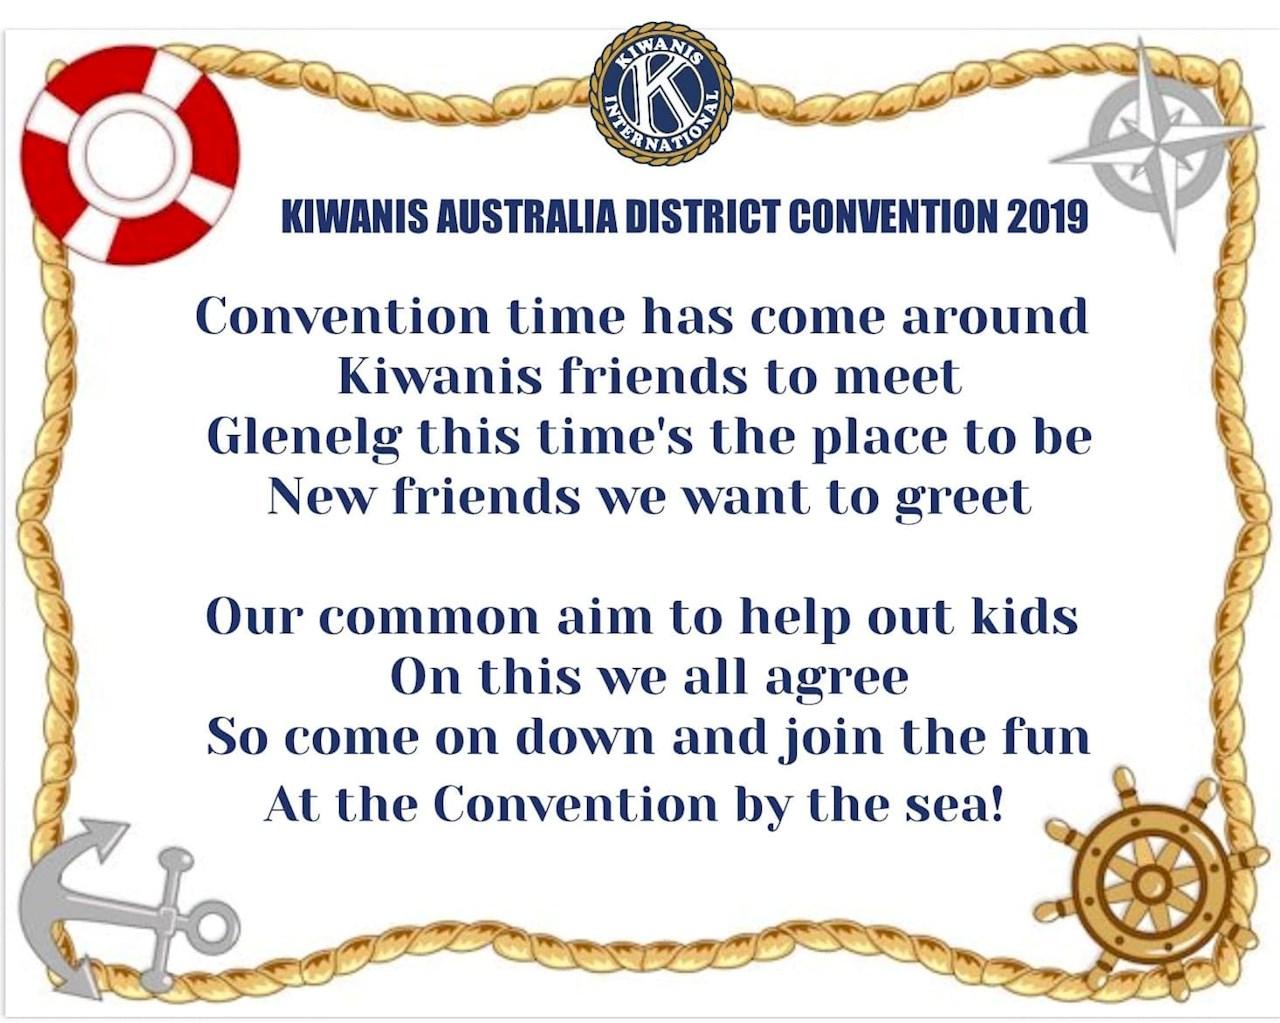 Glenelg - Kiwanis International